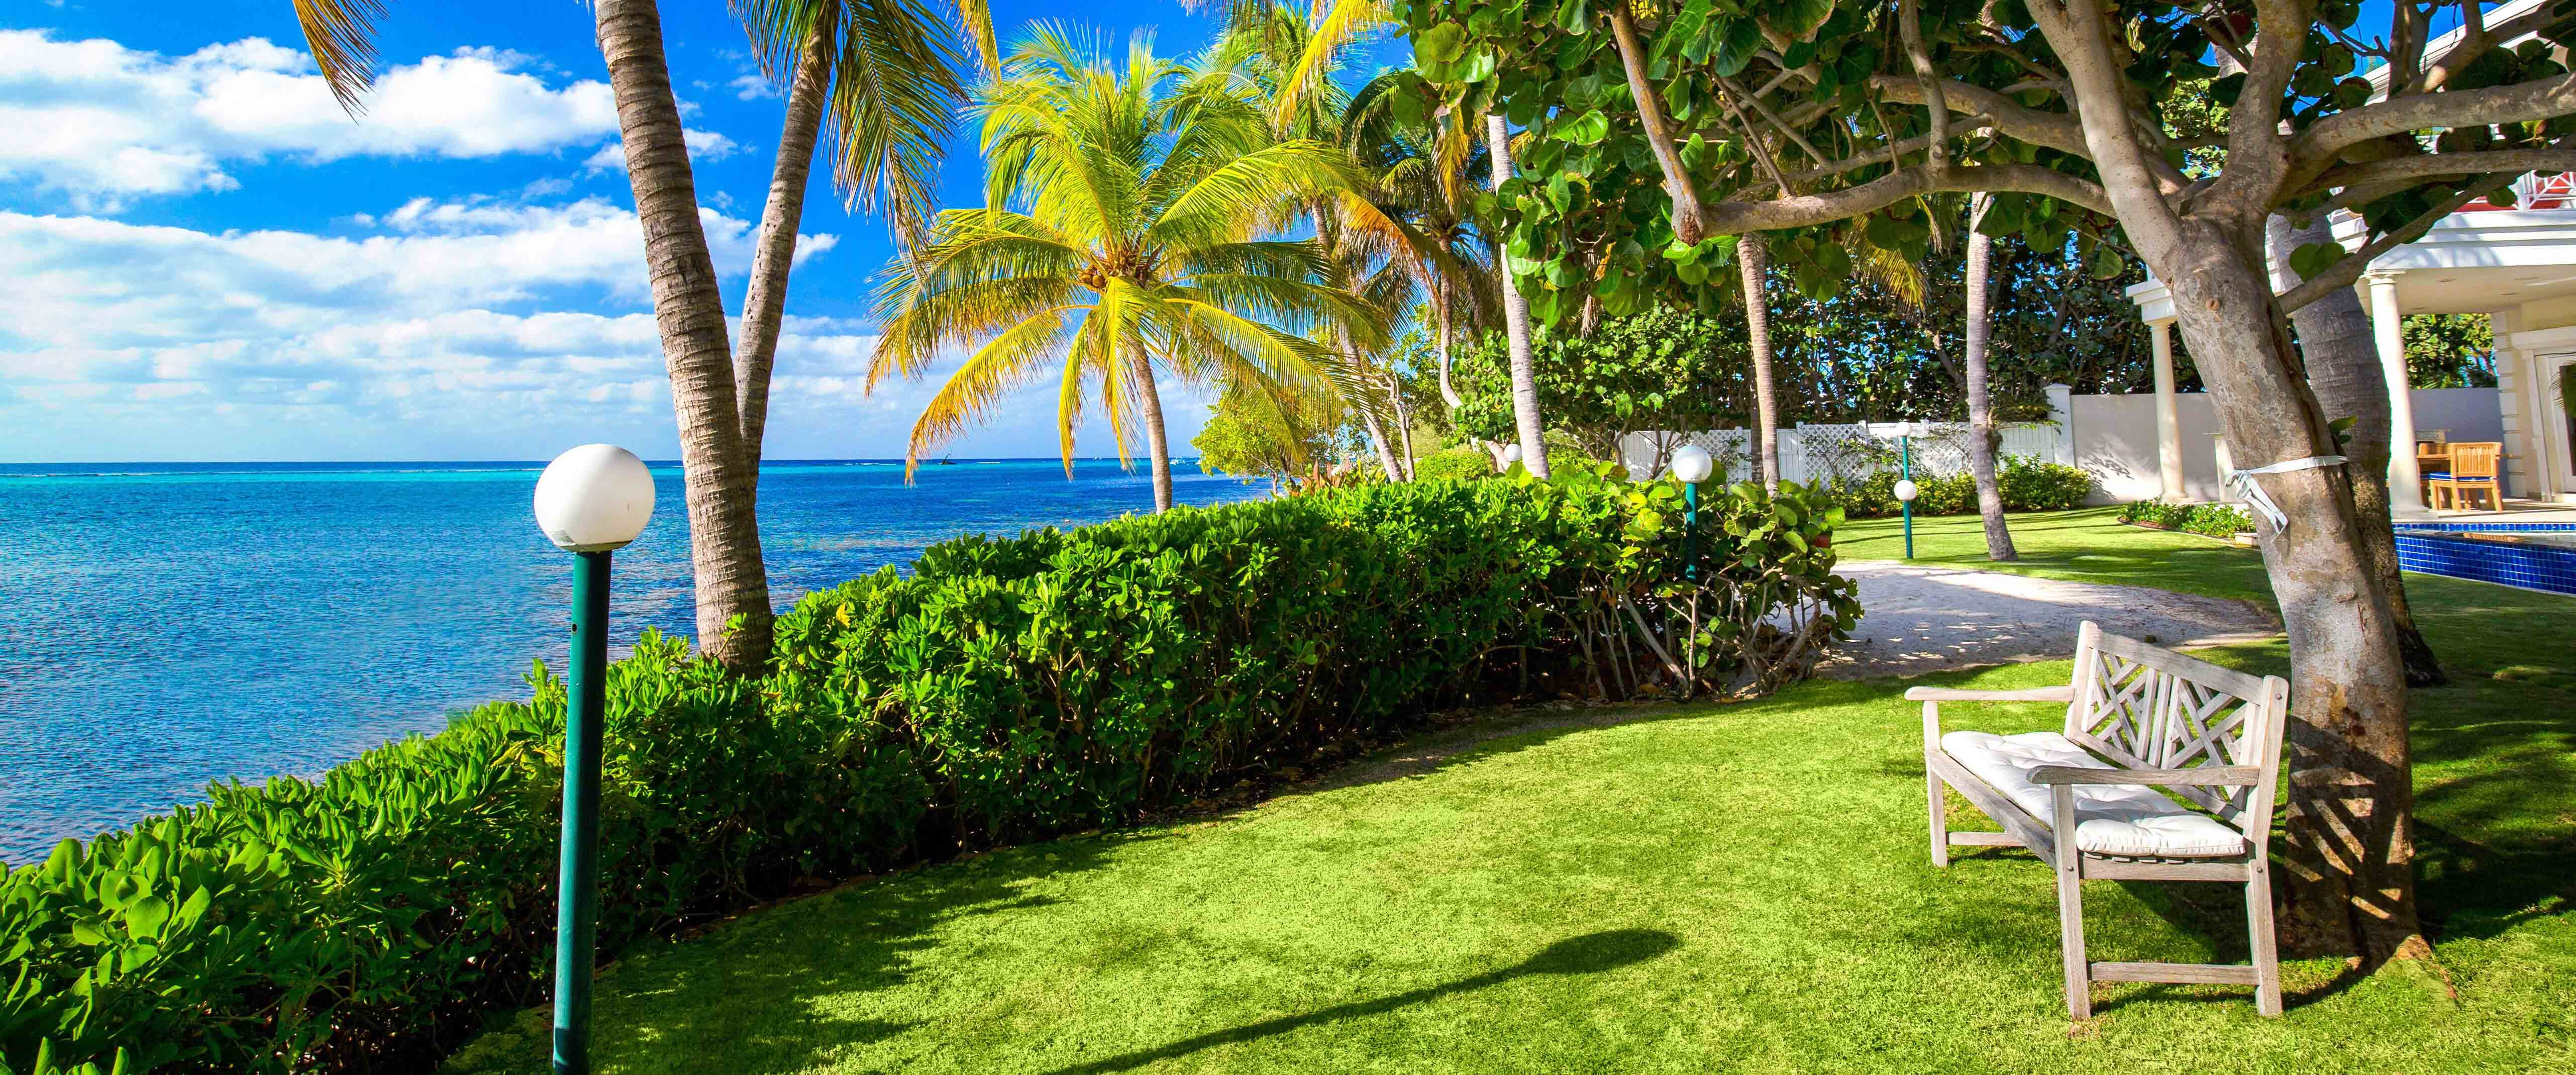 Tatenda Exclusive Vacation Villa Rentals Luxury Cayman